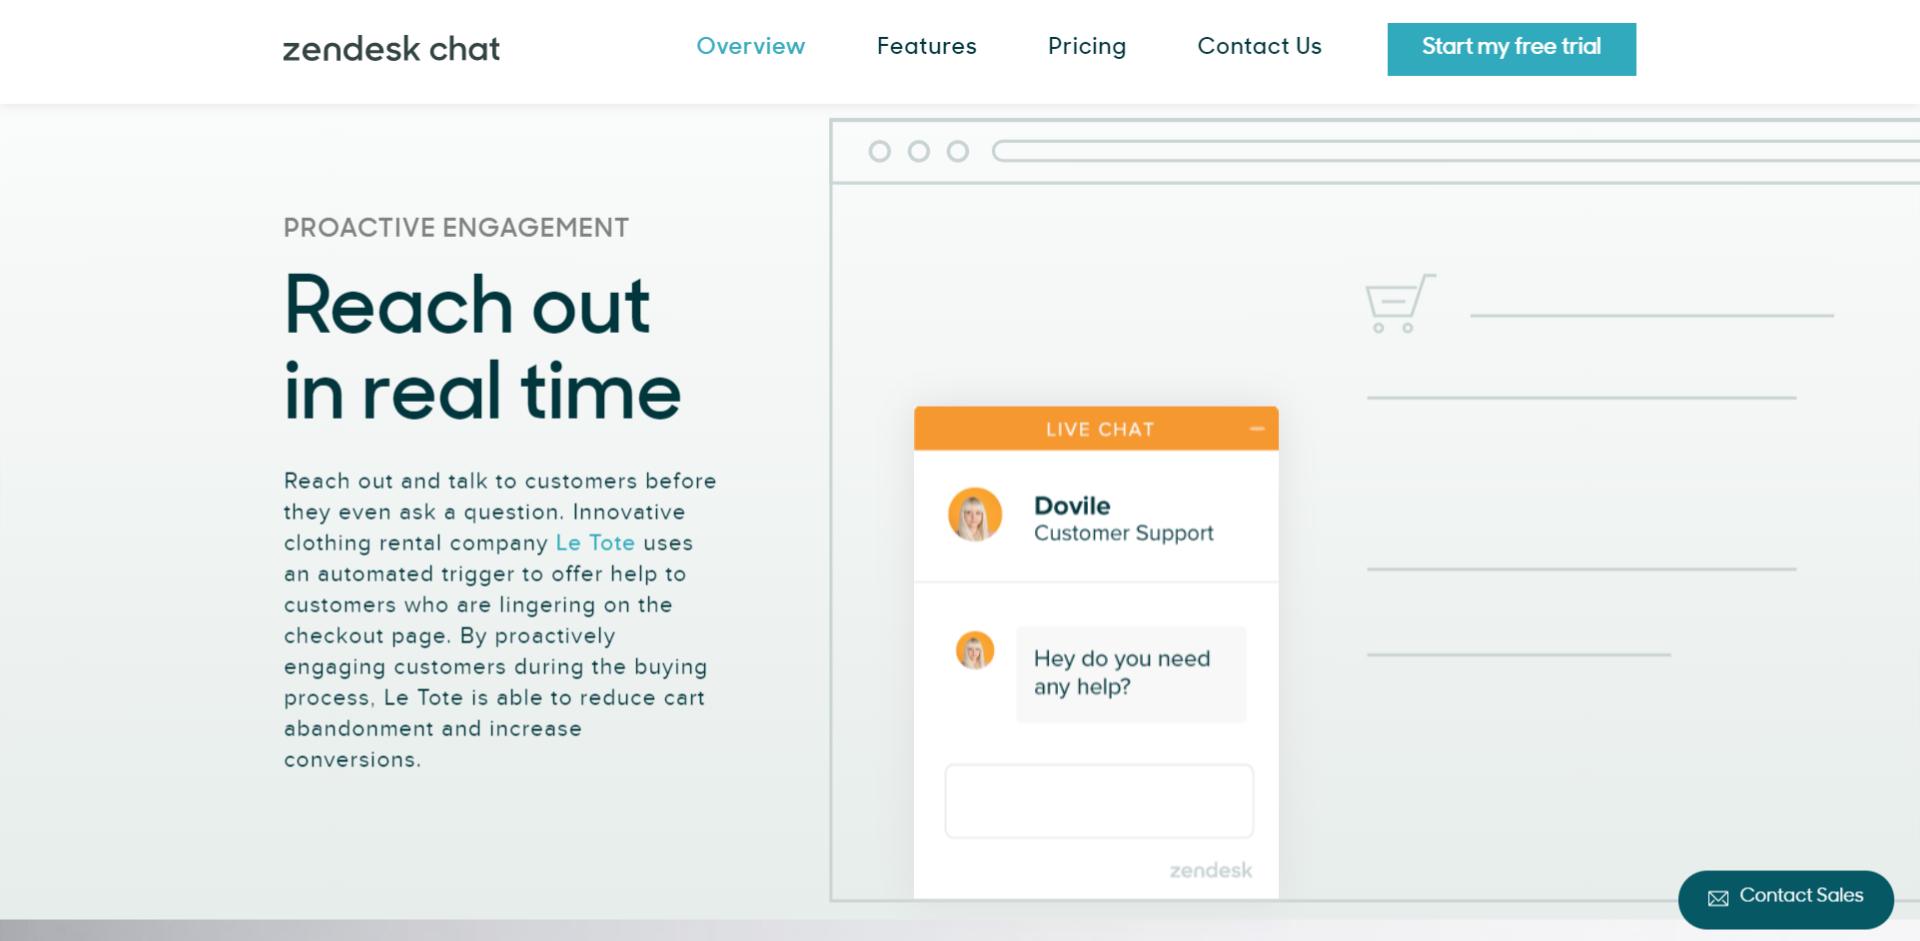 Zendesk chat من أهم خدمات التواصل مع العملاء